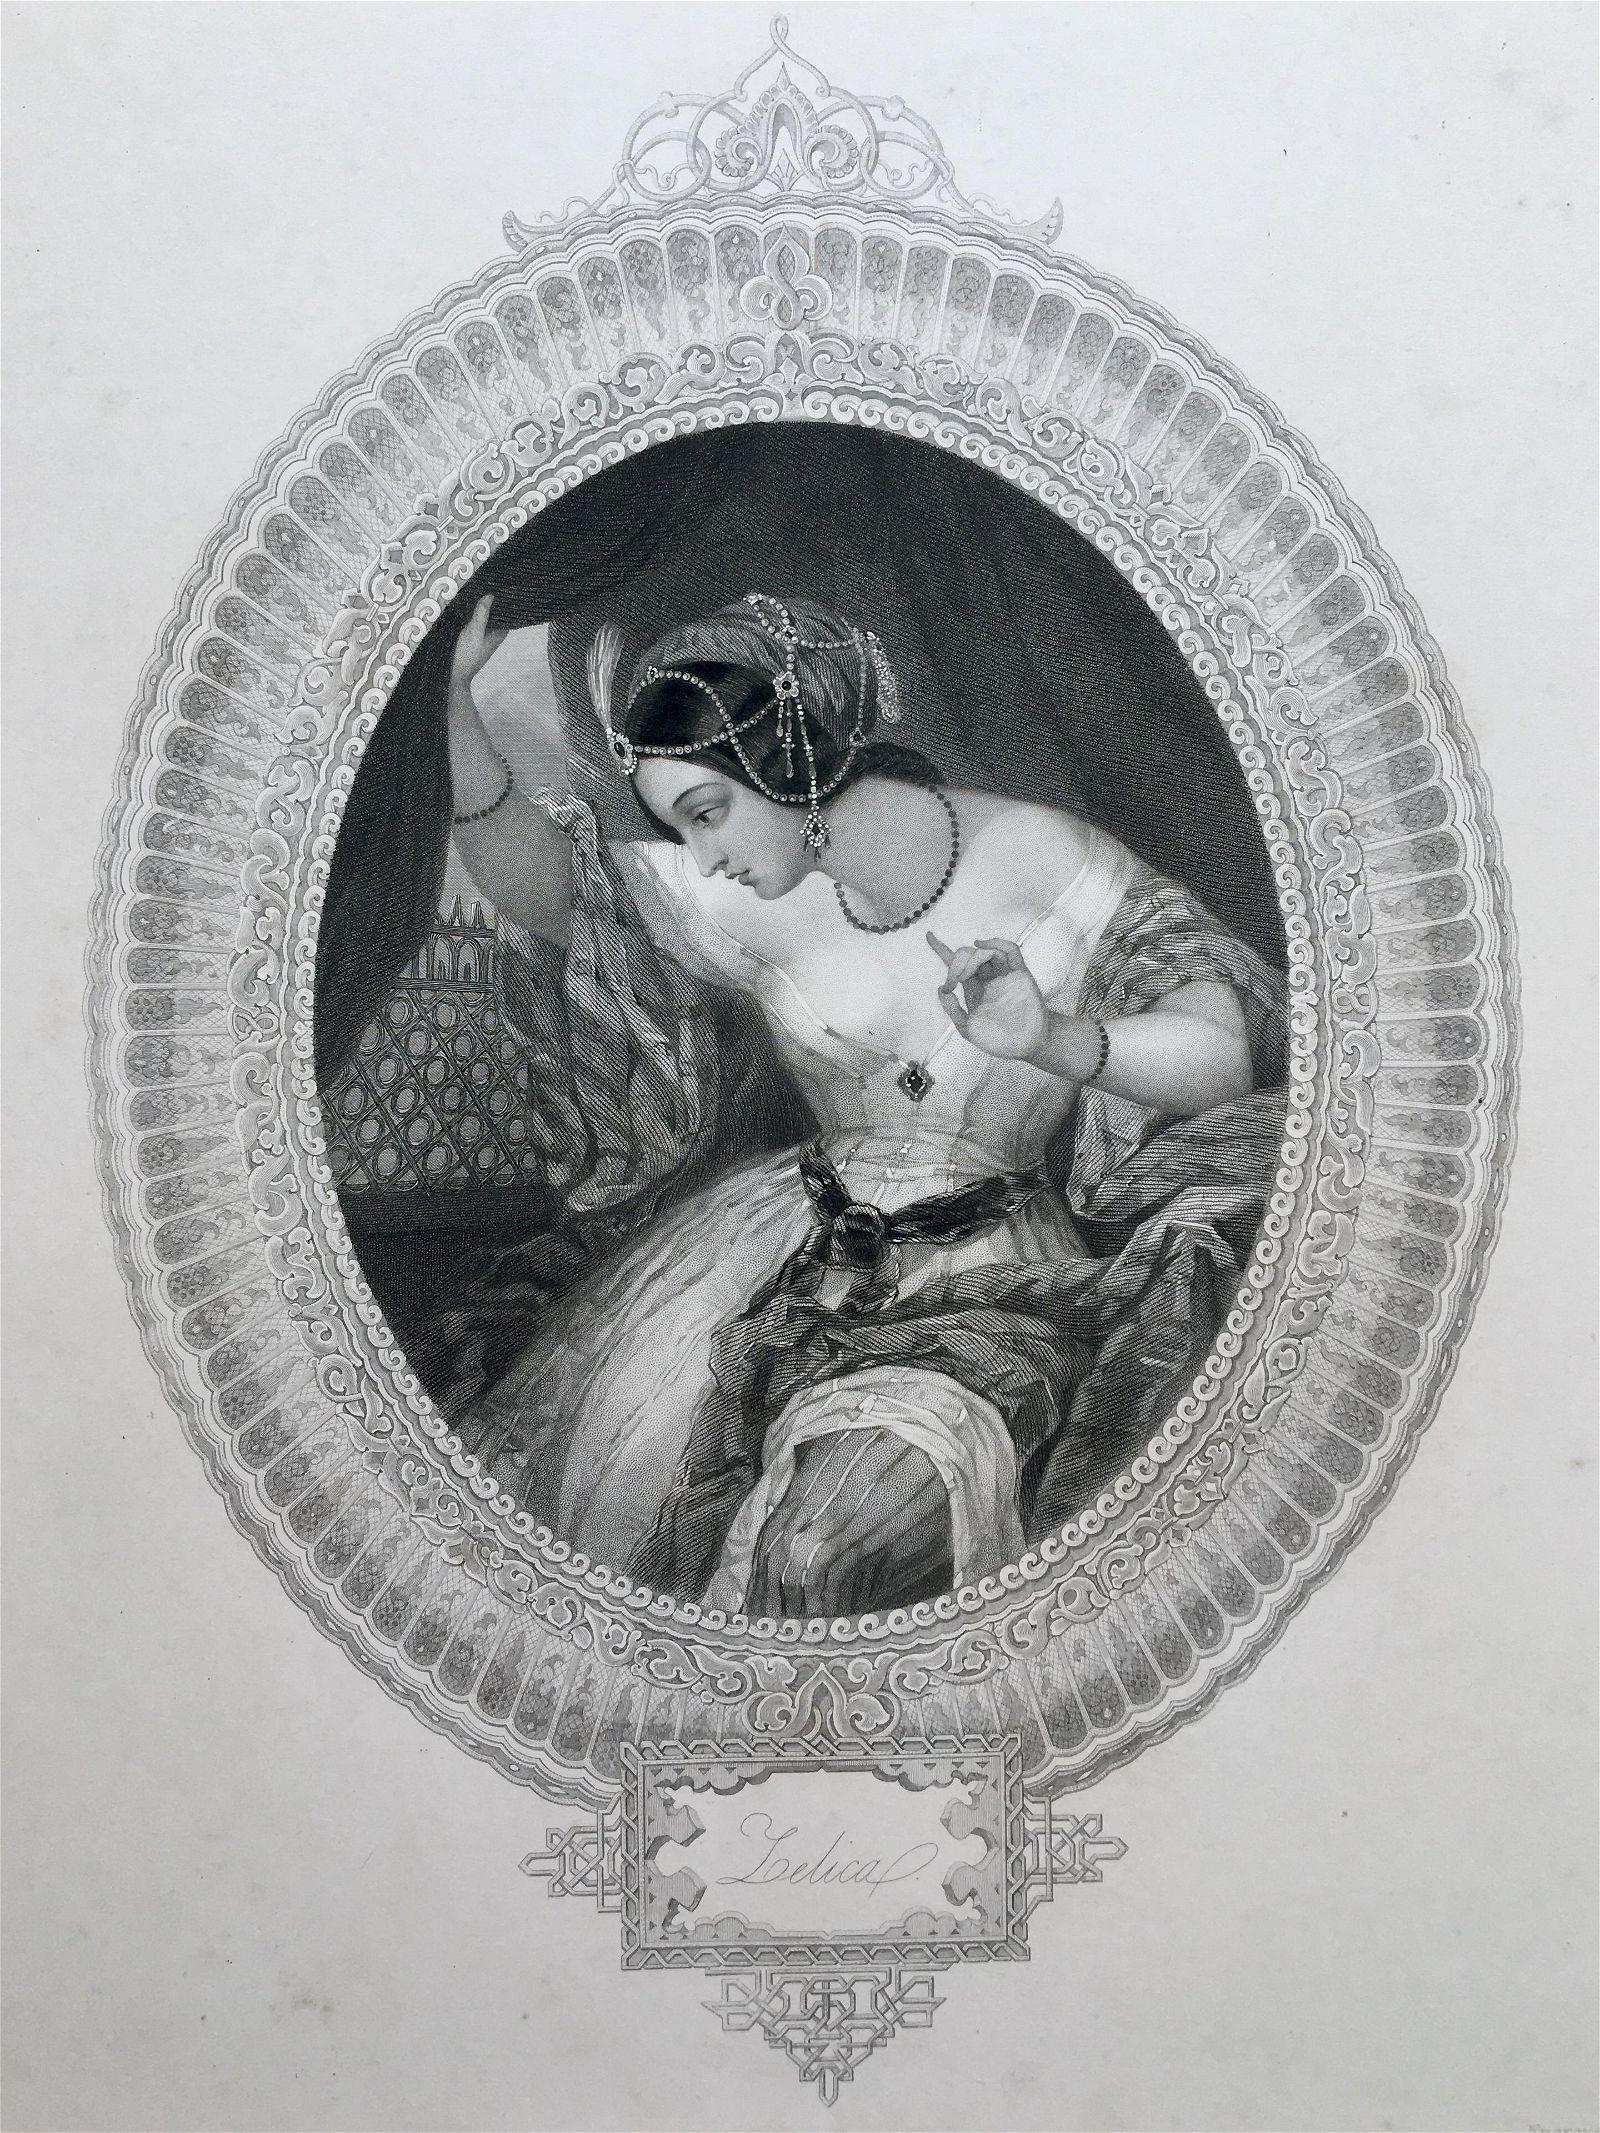 ANTIQUE ROMANTIC ENGRAVING VICTORIAN WOMAN